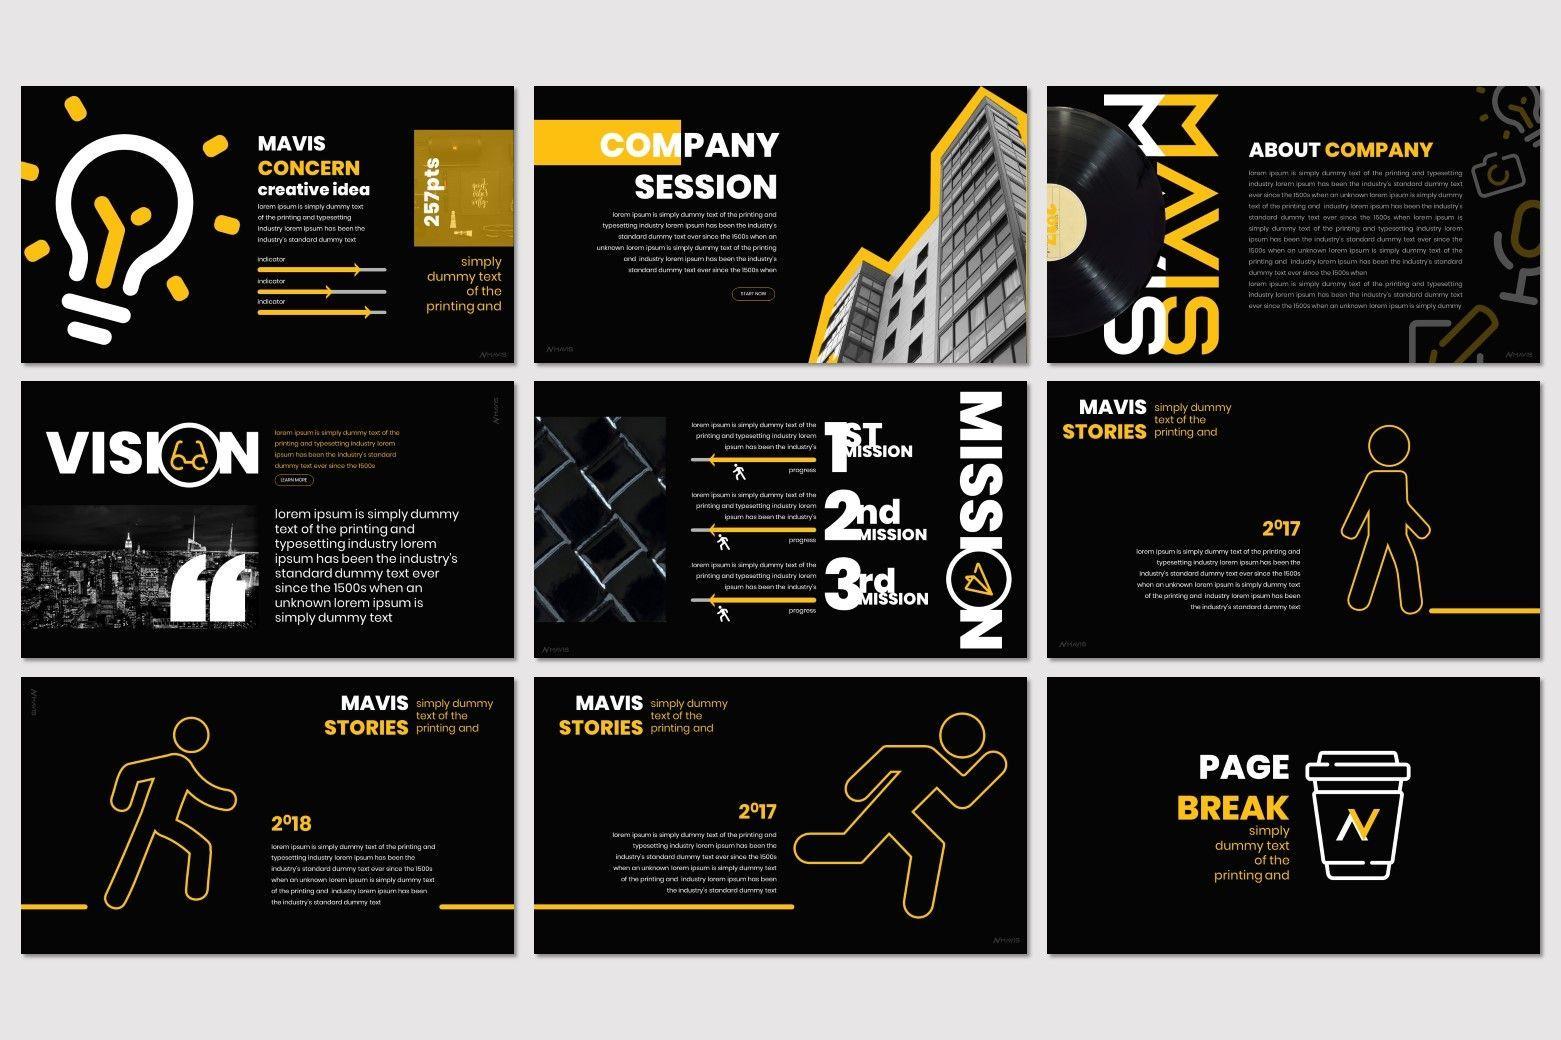 Mavis - PowerPoint Template, Slide 3, 07266, Presentation Templates — PoweredTemplate.com